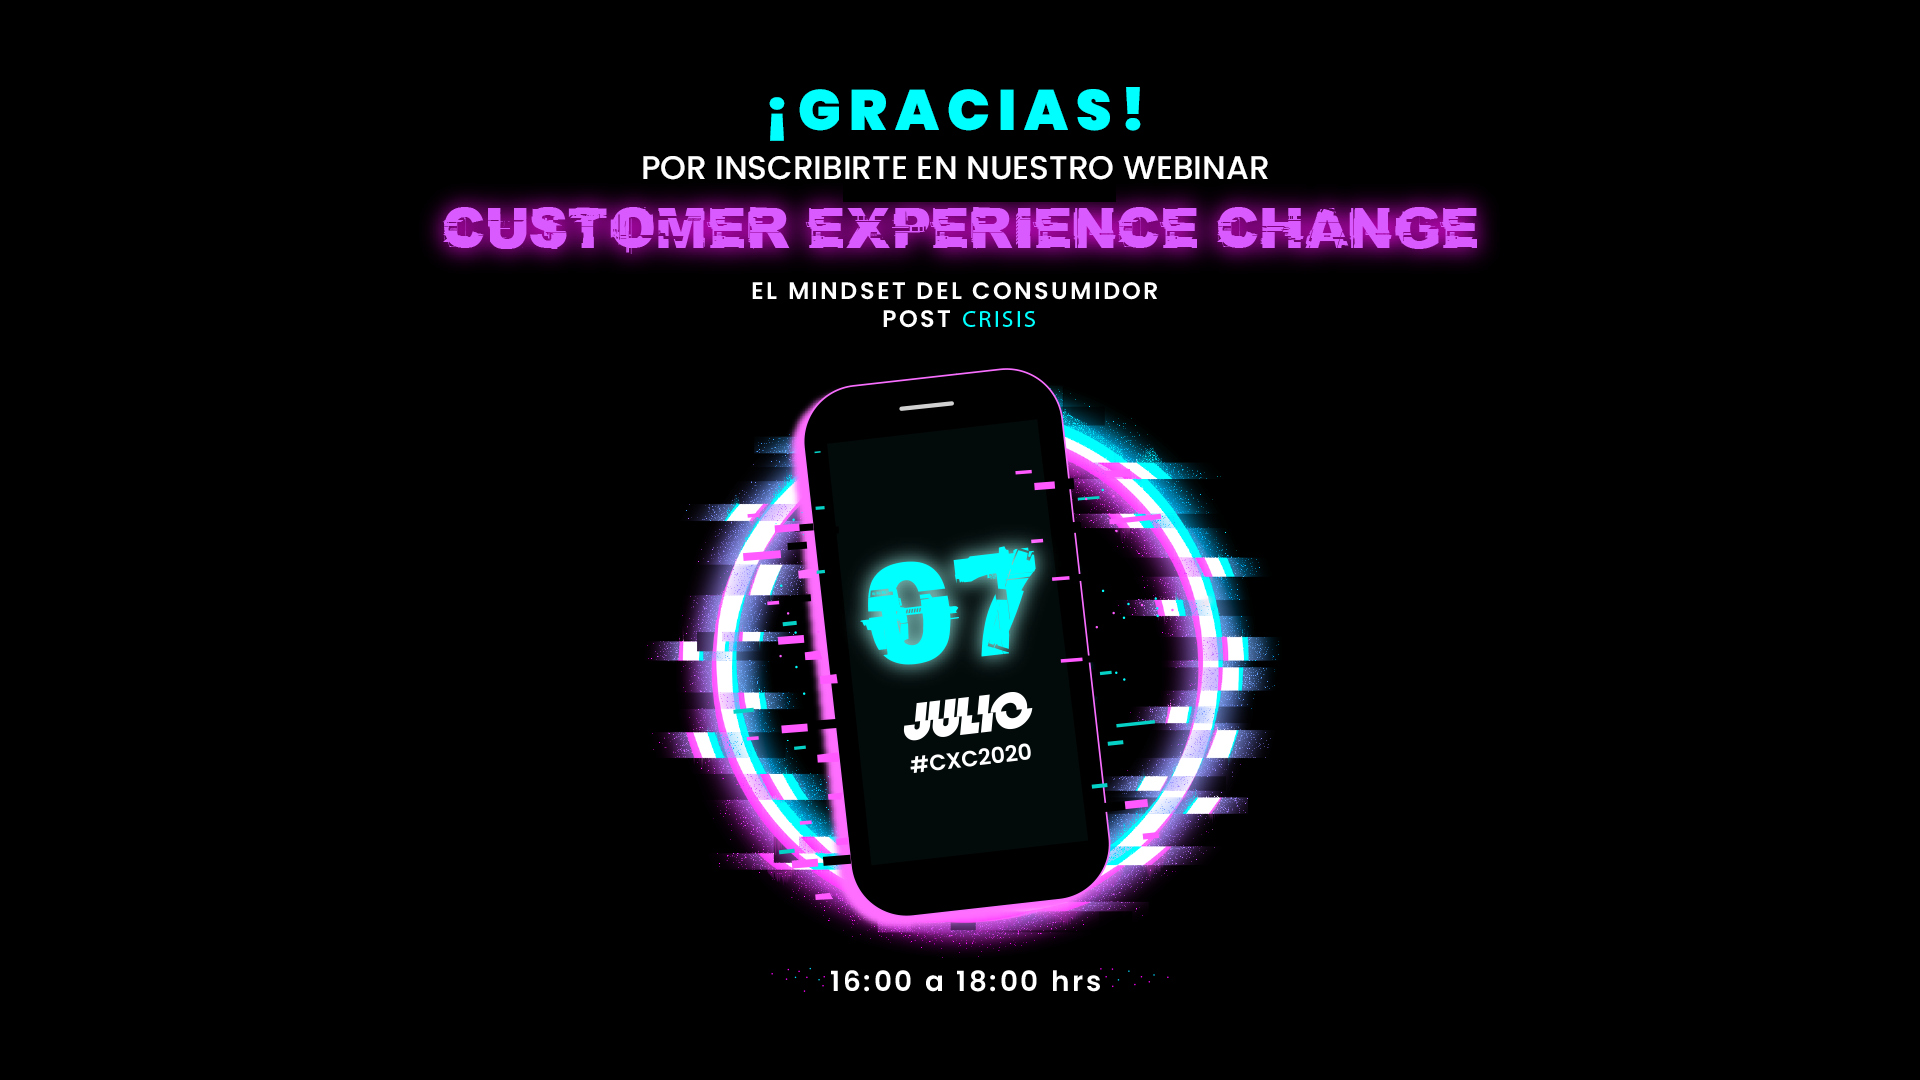 Webinar Gracias costumer experience webinar